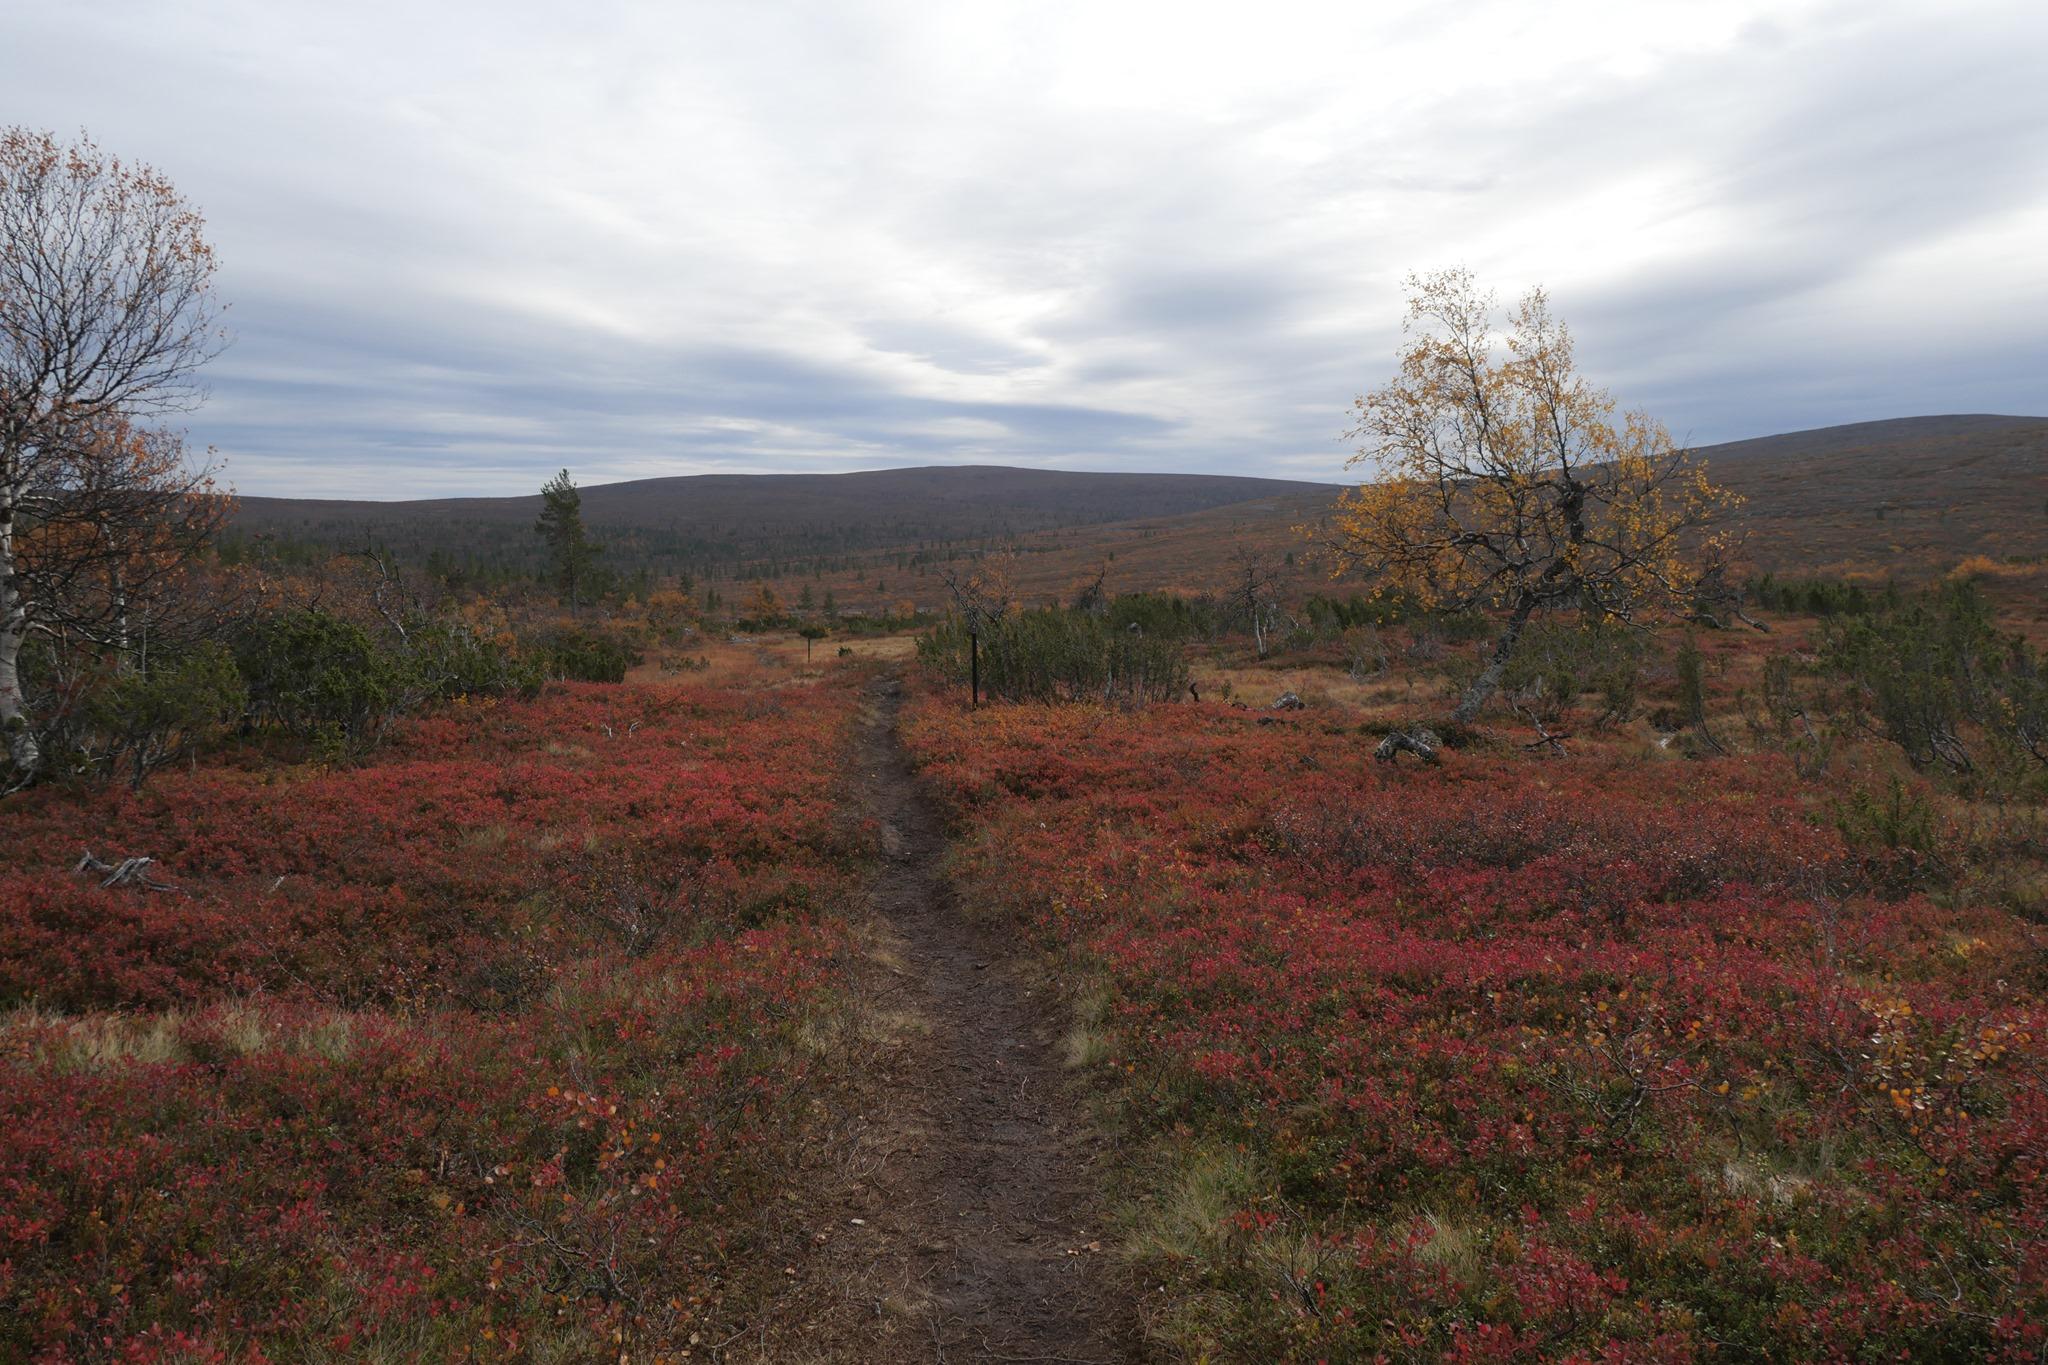 Urho-Kekkonen-Nationalpark in Finnisch-Lappland